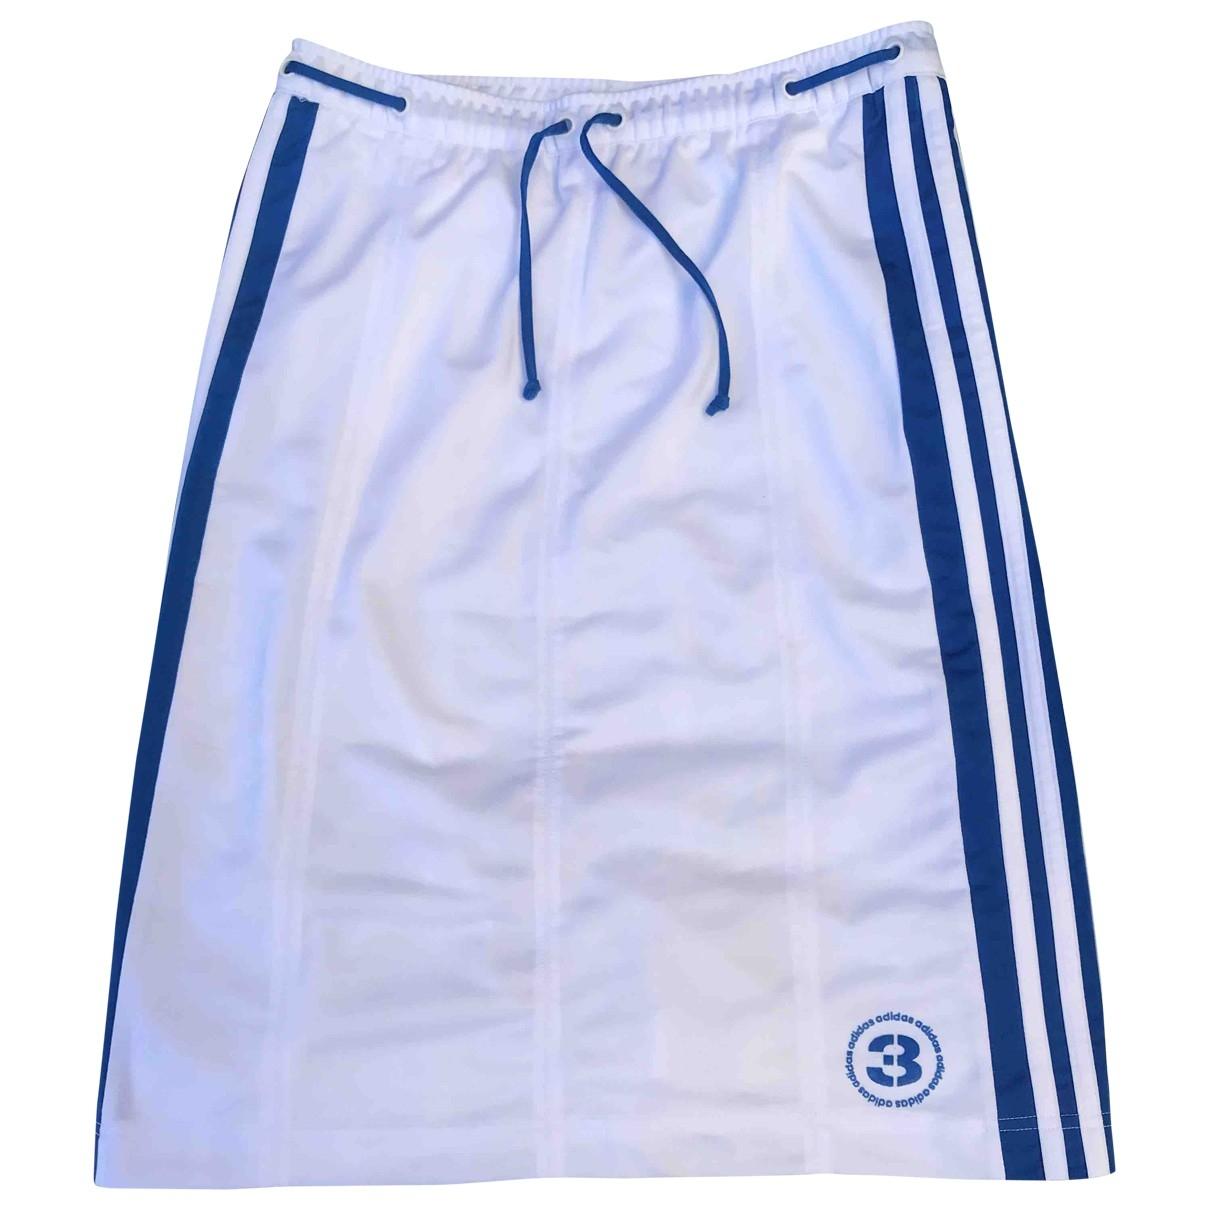 Adidas \N Rocke in  Weiss Polyester